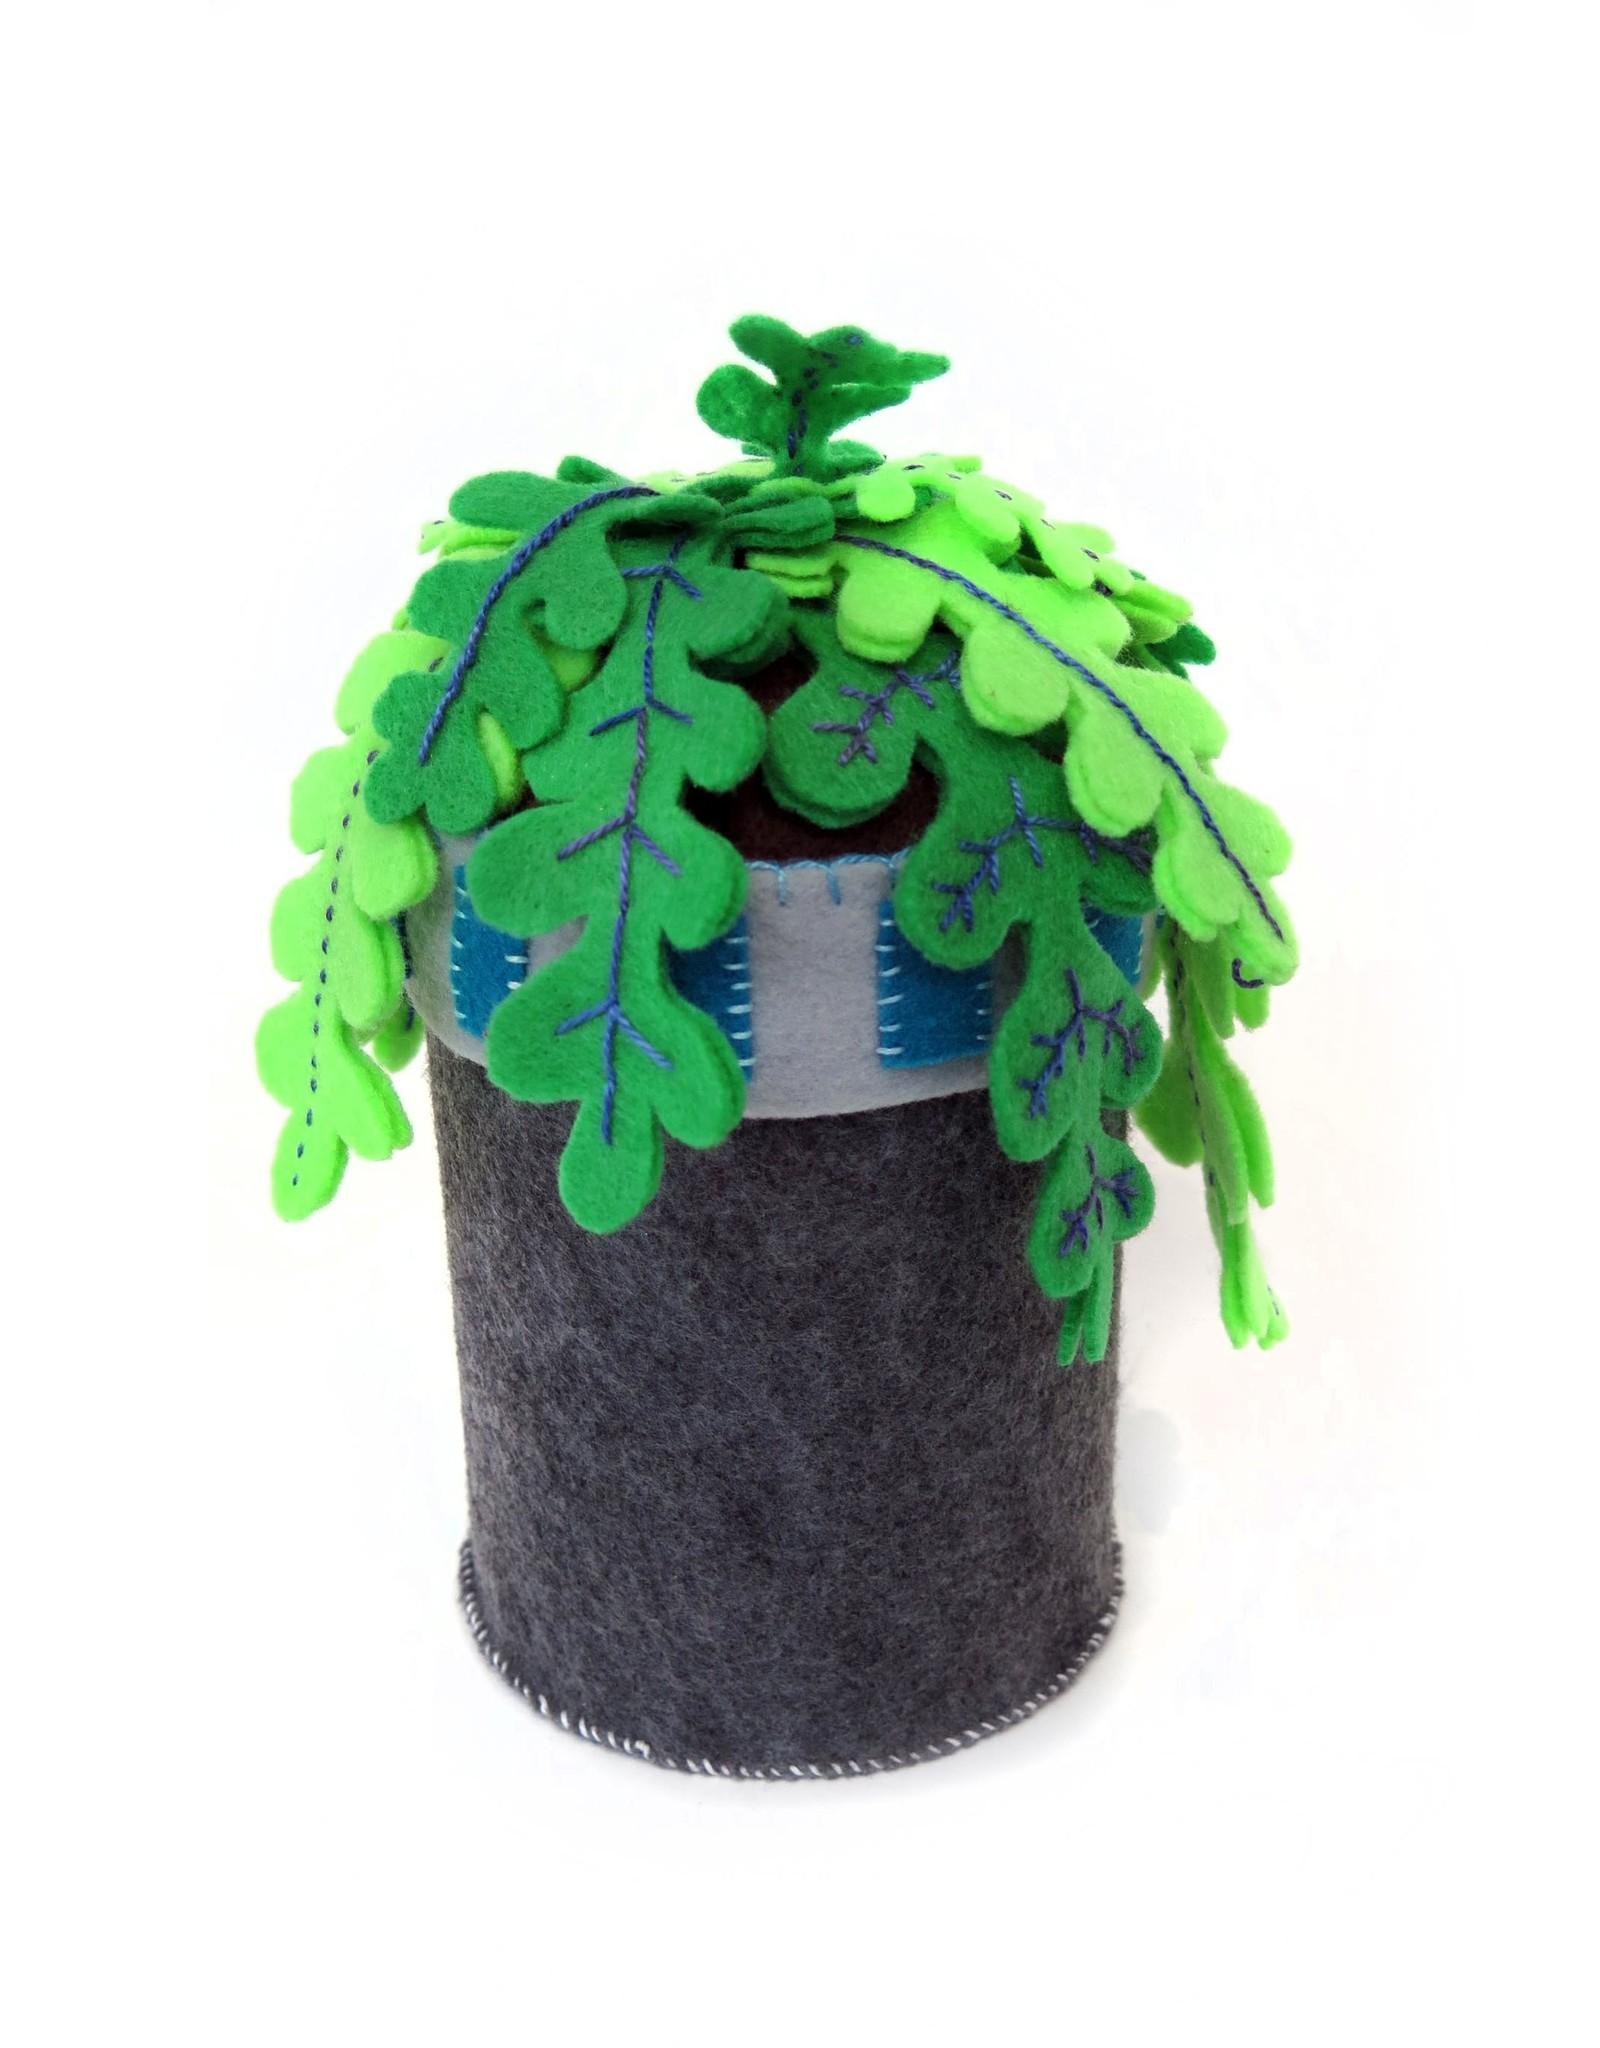 Olivia Olsen Felt Plant - small, by Olivia Olsen